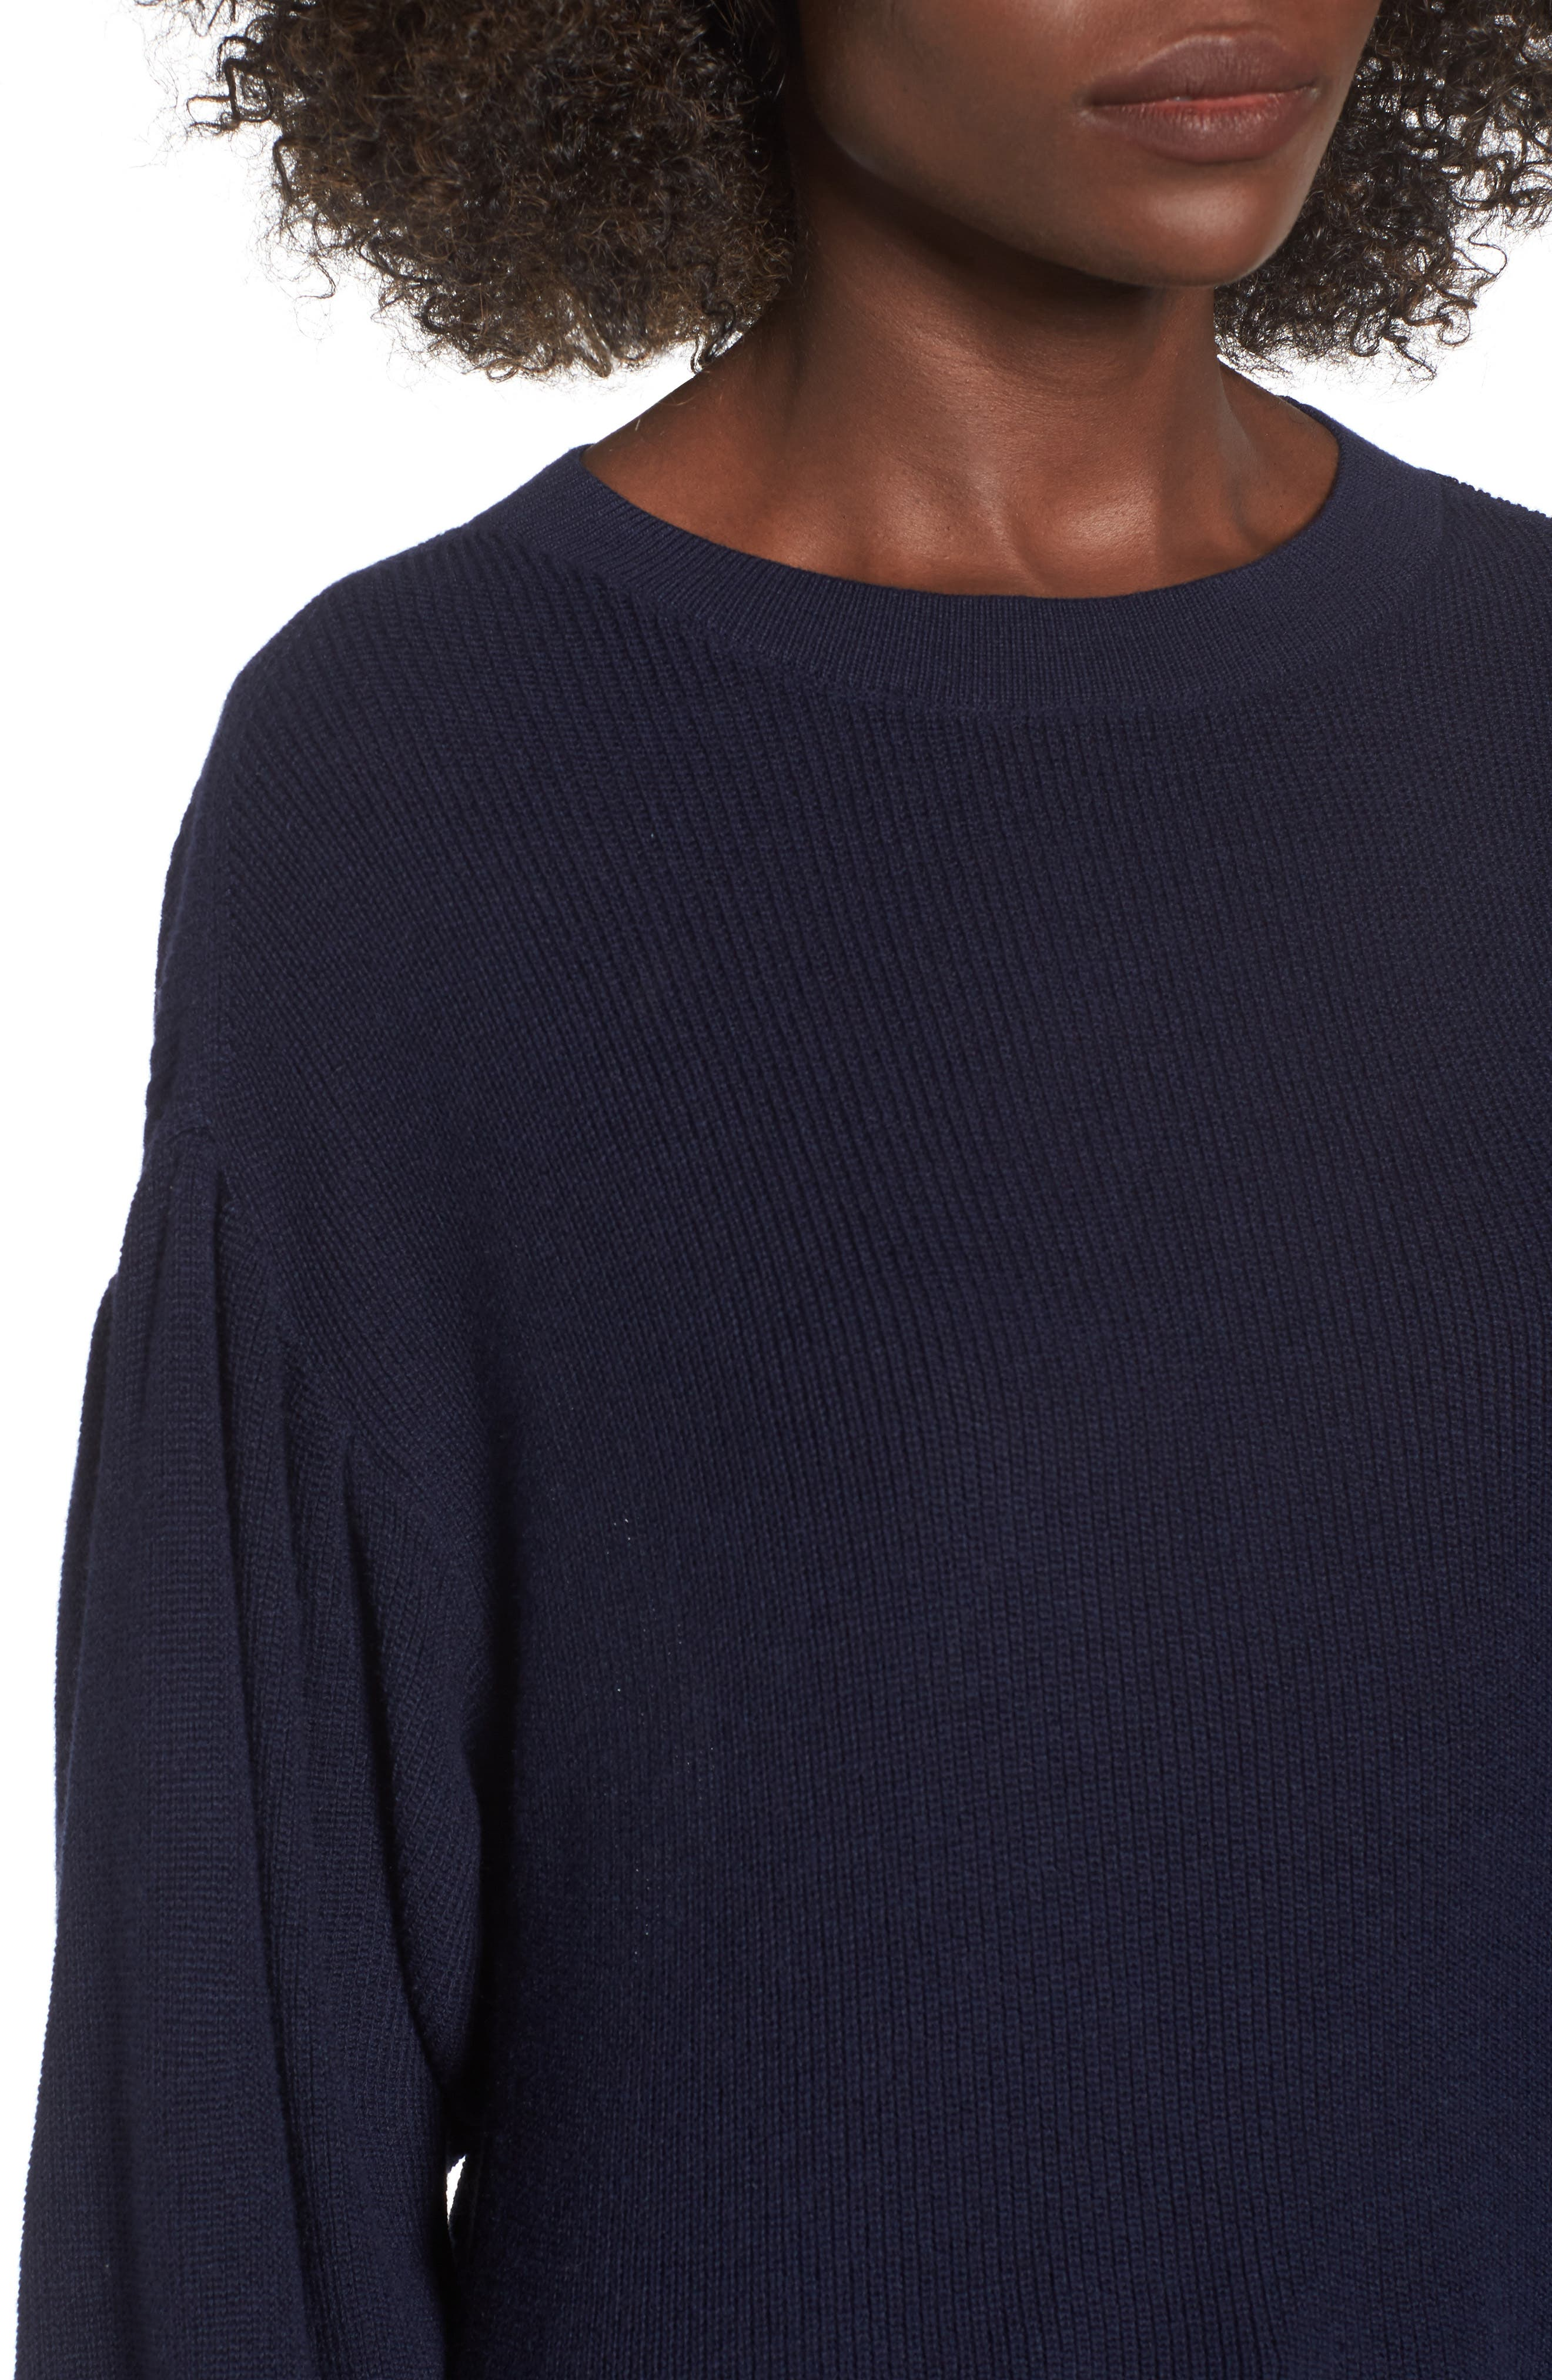 Drape Sleeve Sweater,                             Alternate thumbnail 4, color,                             Navy Evening